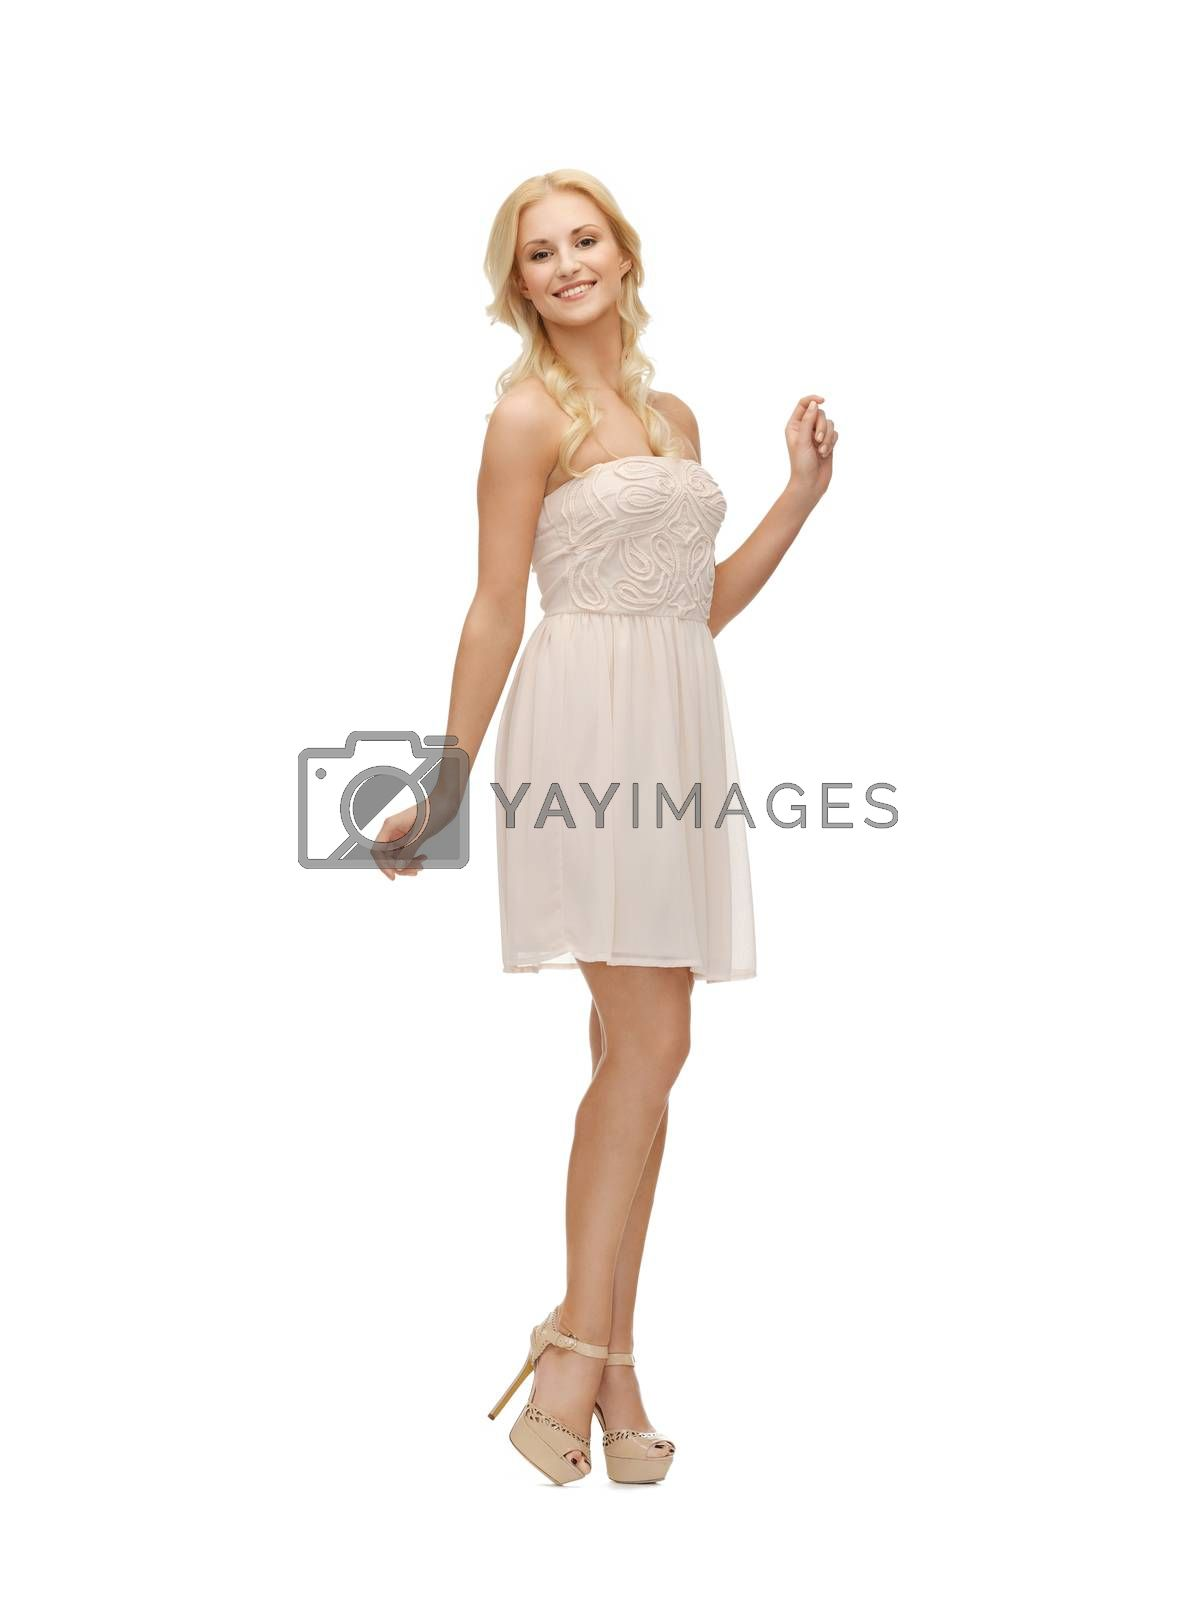 woman in white dress by dolgachov